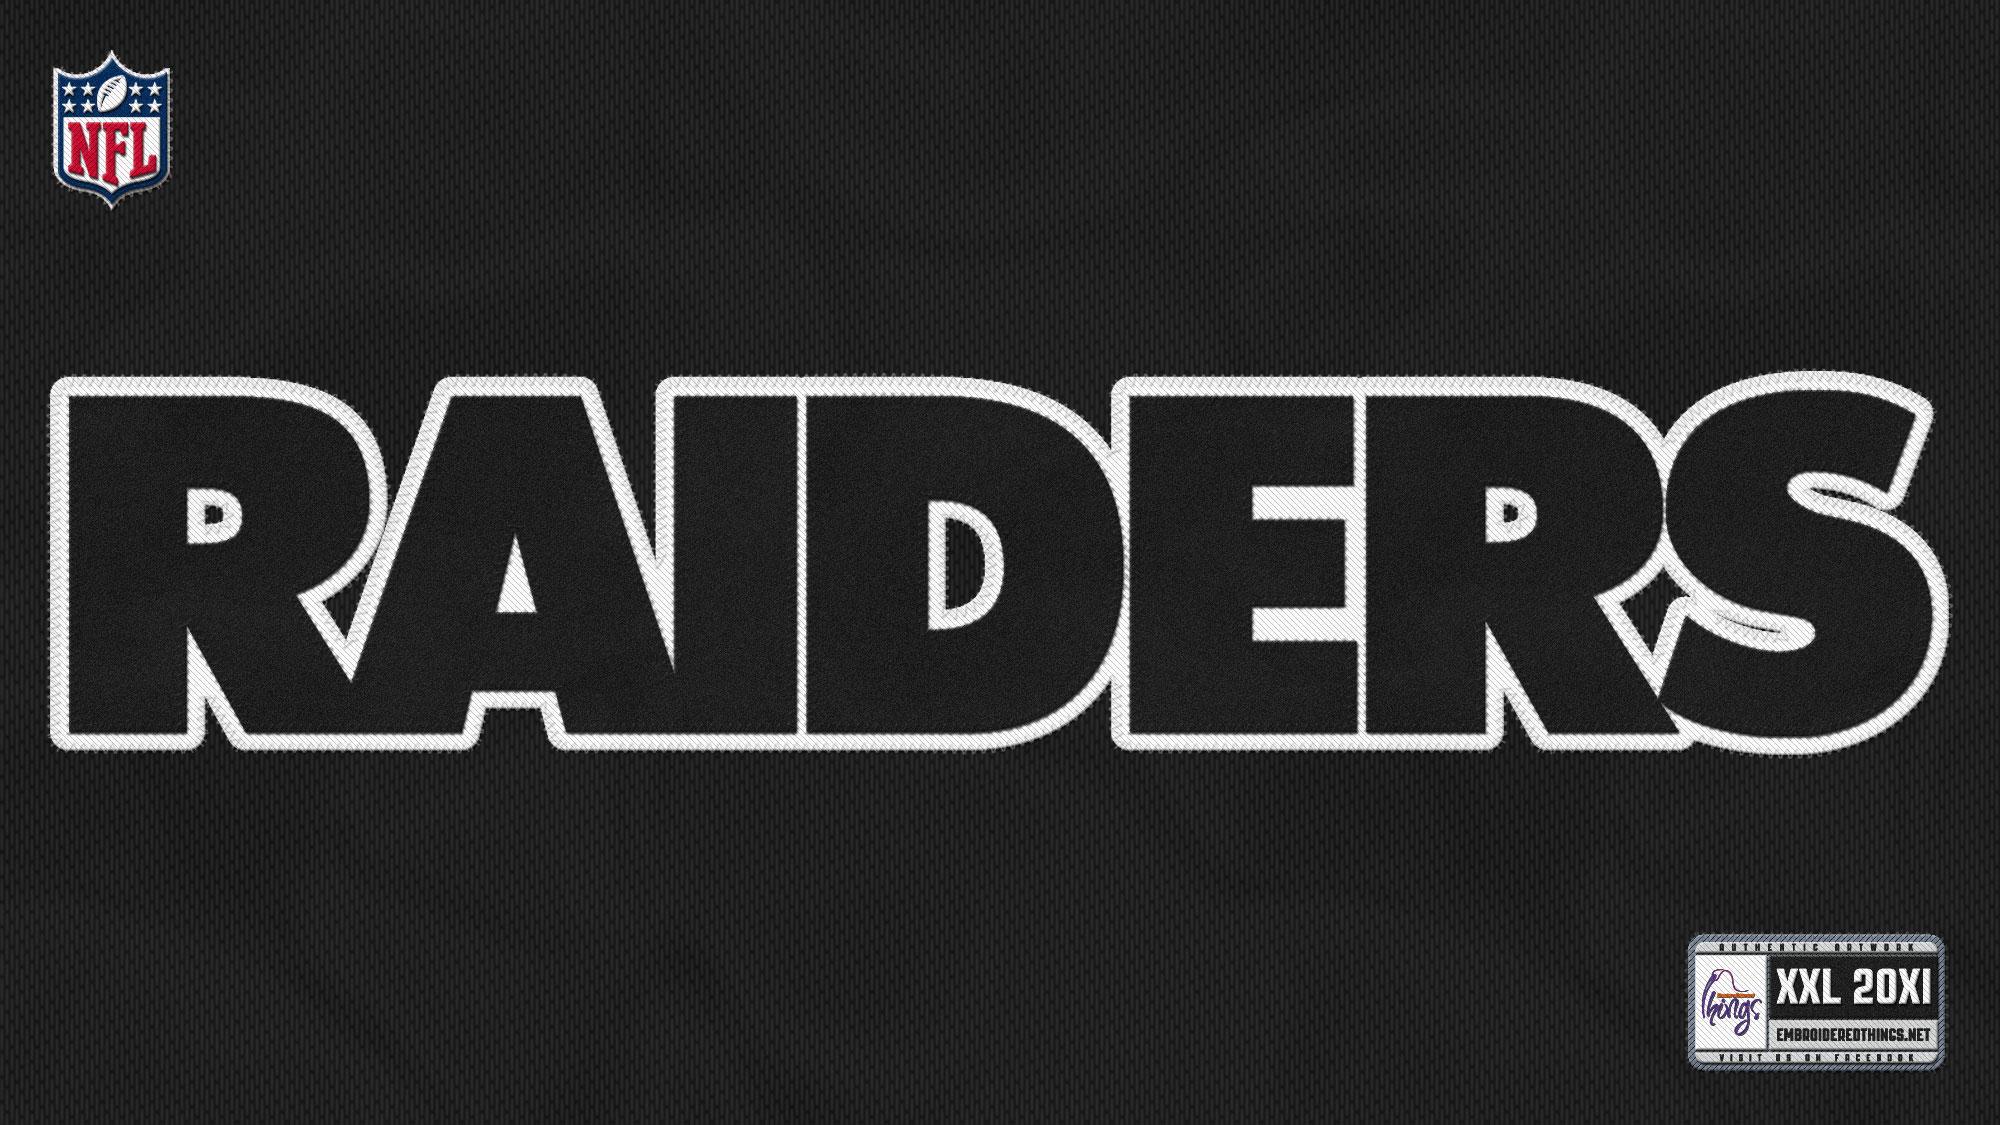 Raiders Wallpaper 14624 2000x1125 Px HDWallSource